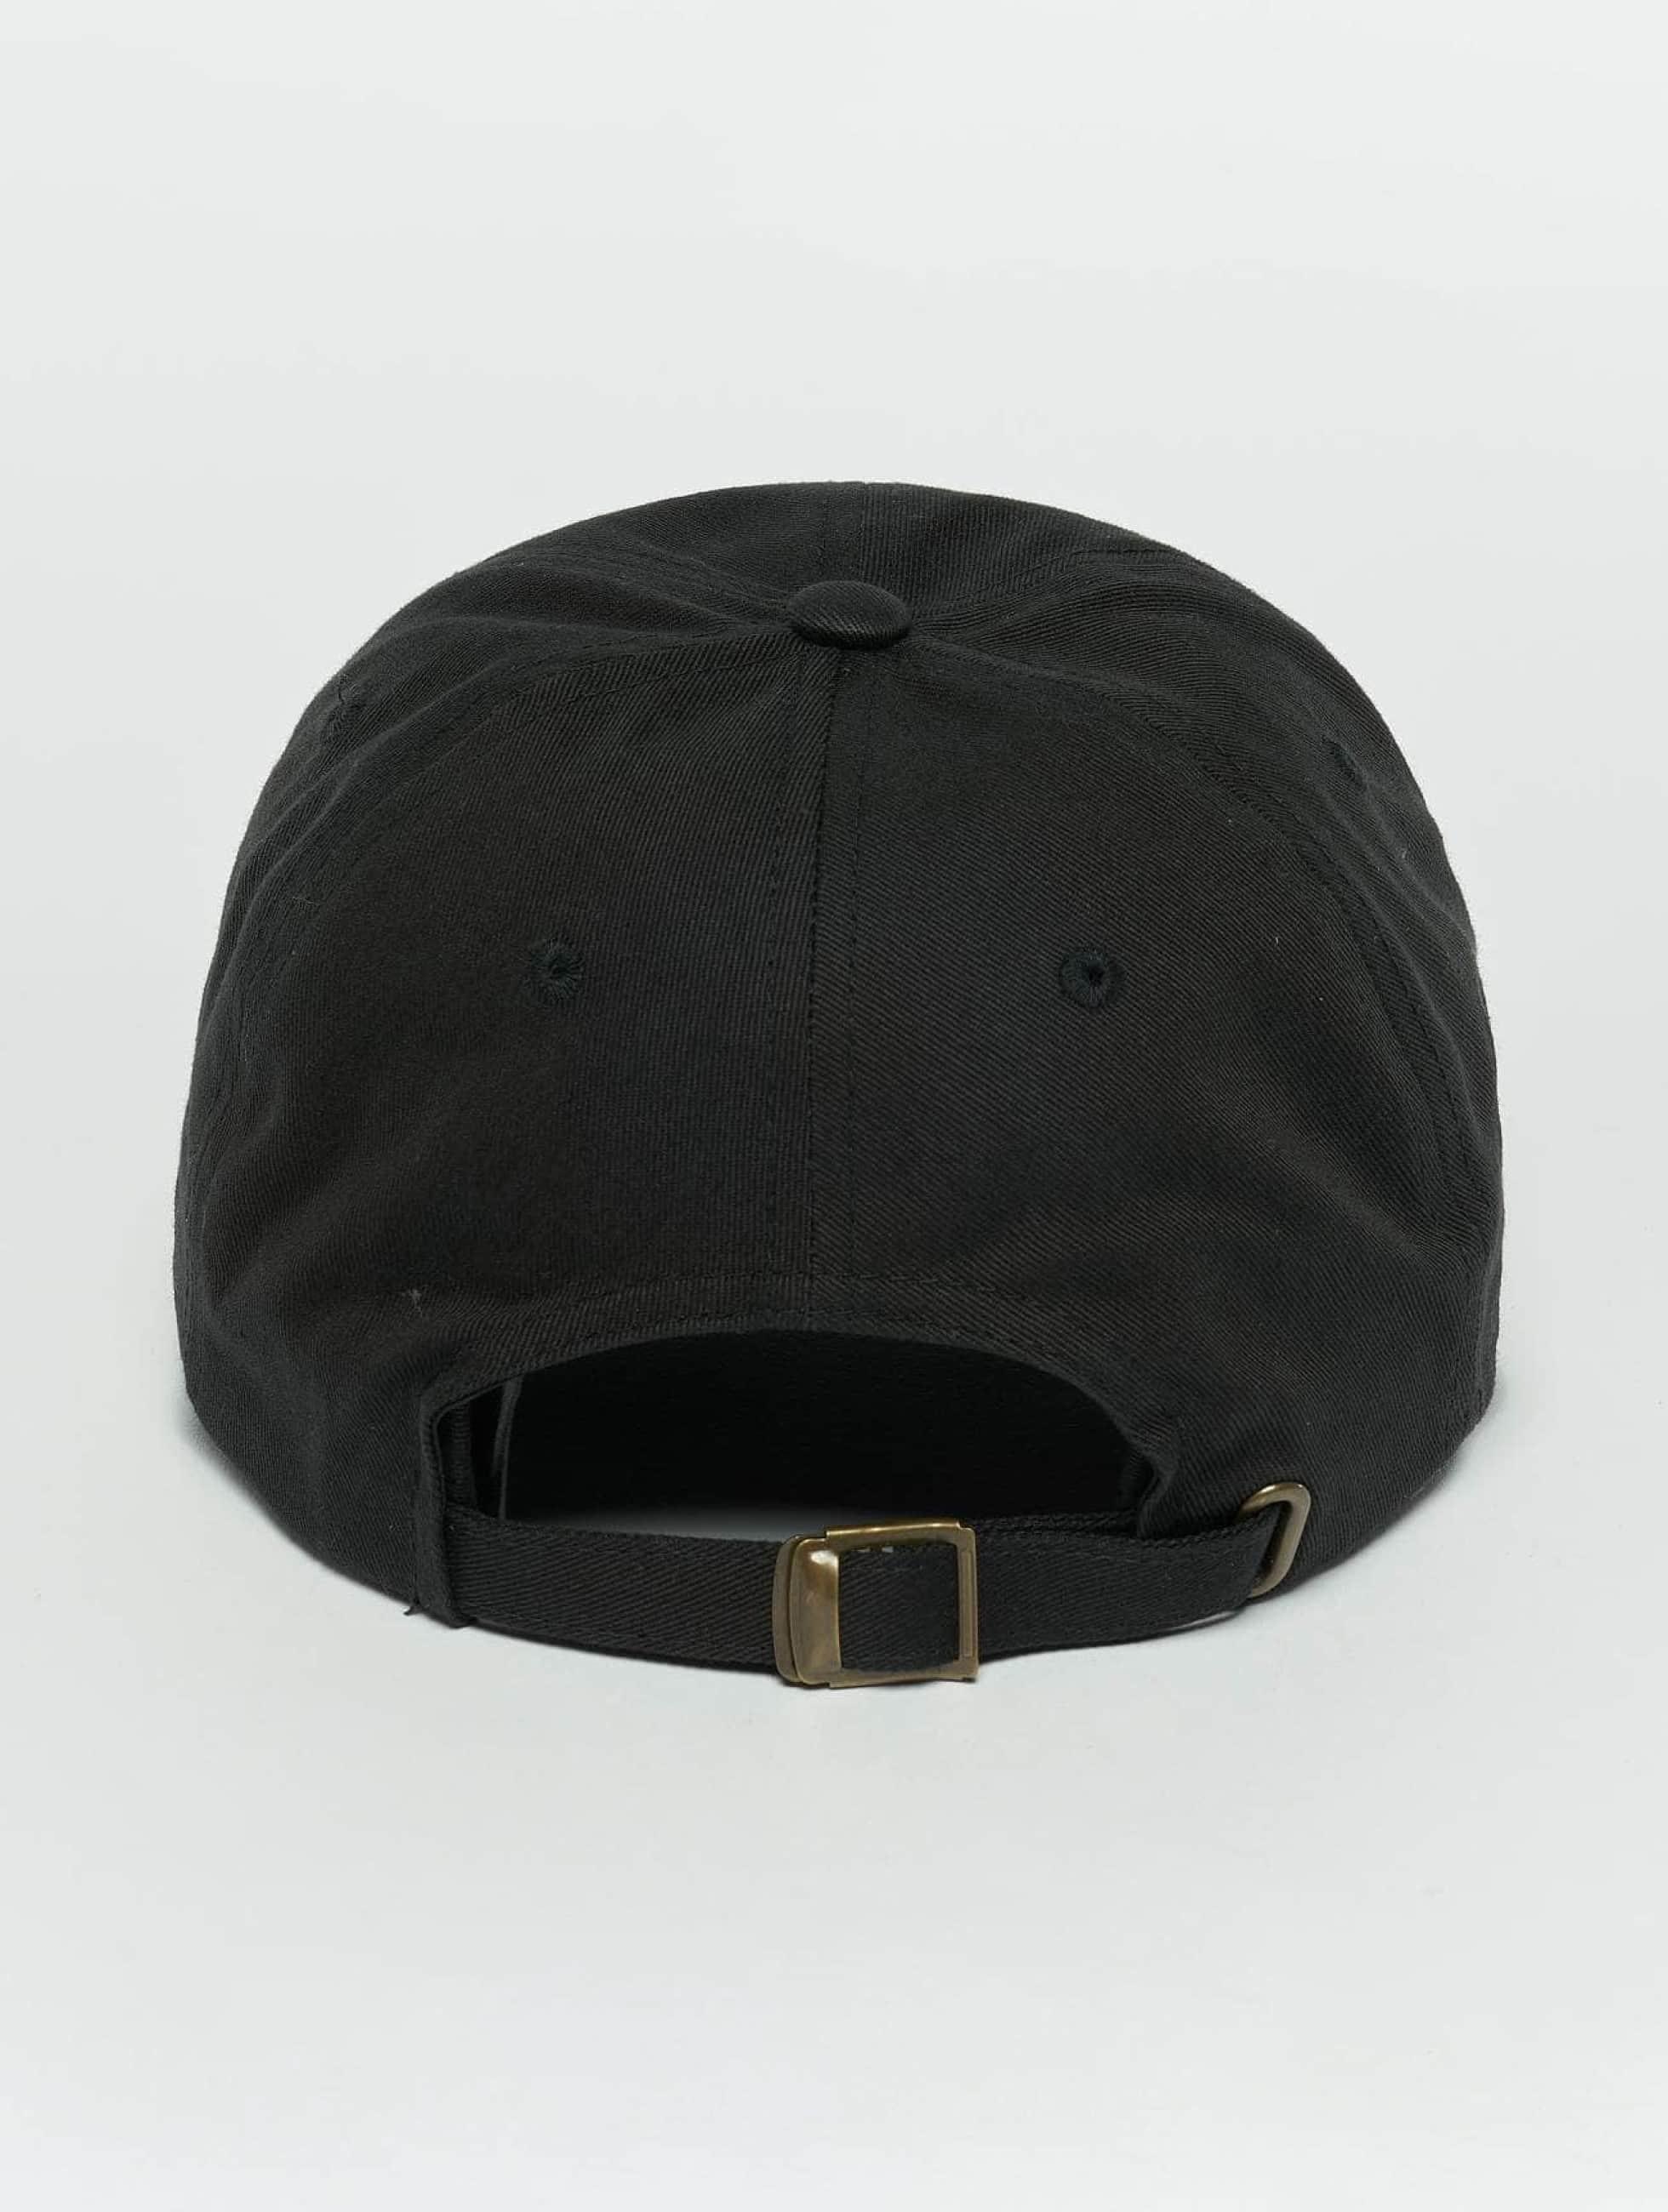 TurnUP Casquette Snapback & Strapback Dad noir